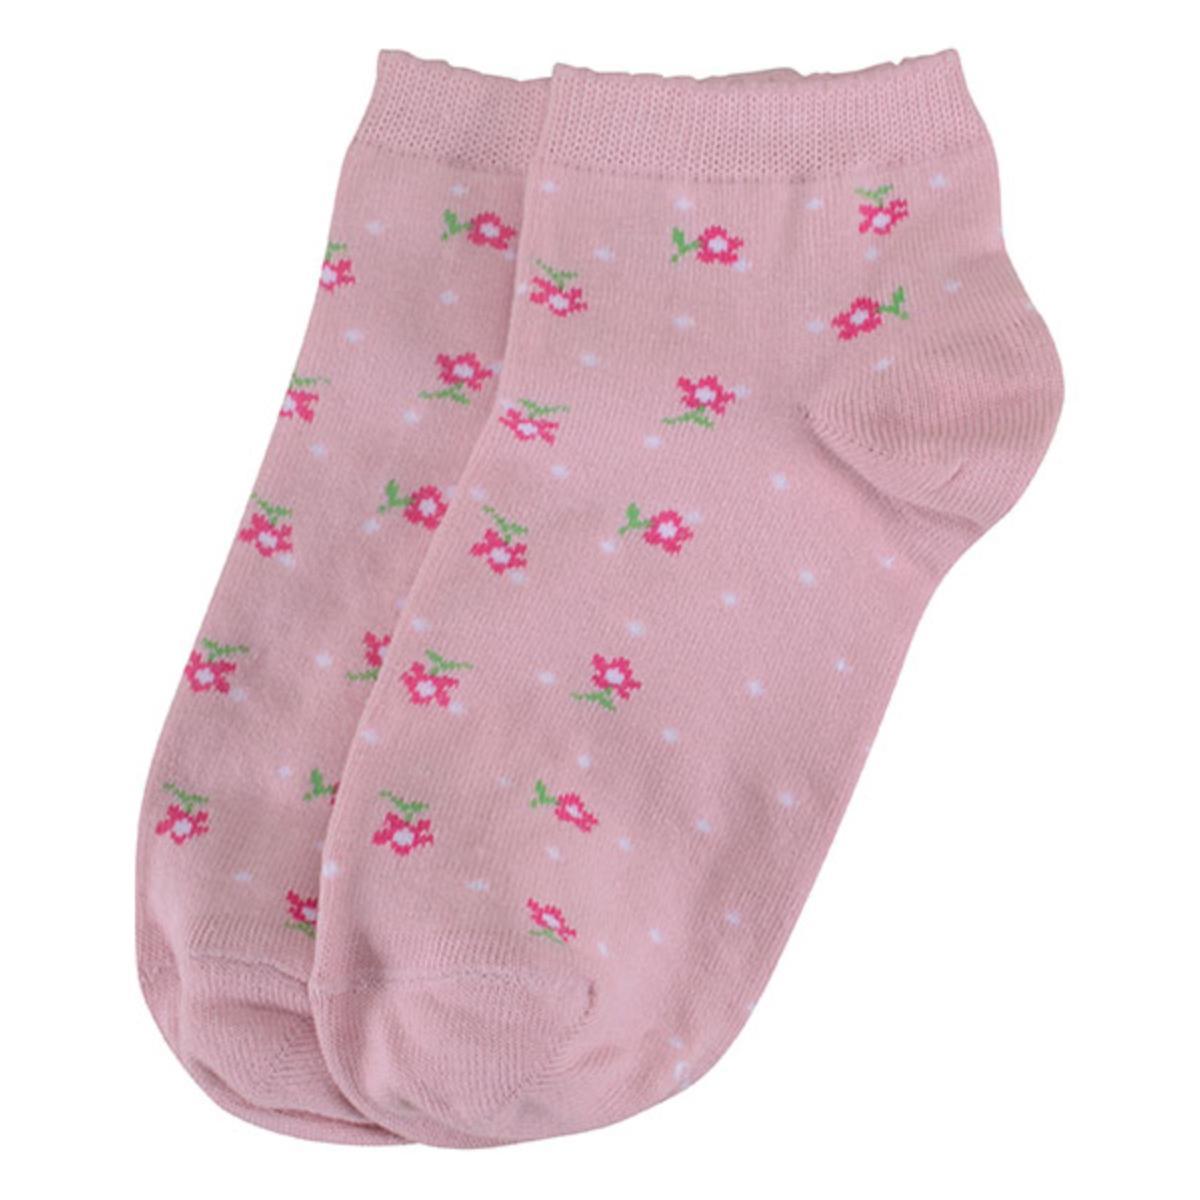 Meia Feminina Lupo 4535 224 5410 Rosa/pink